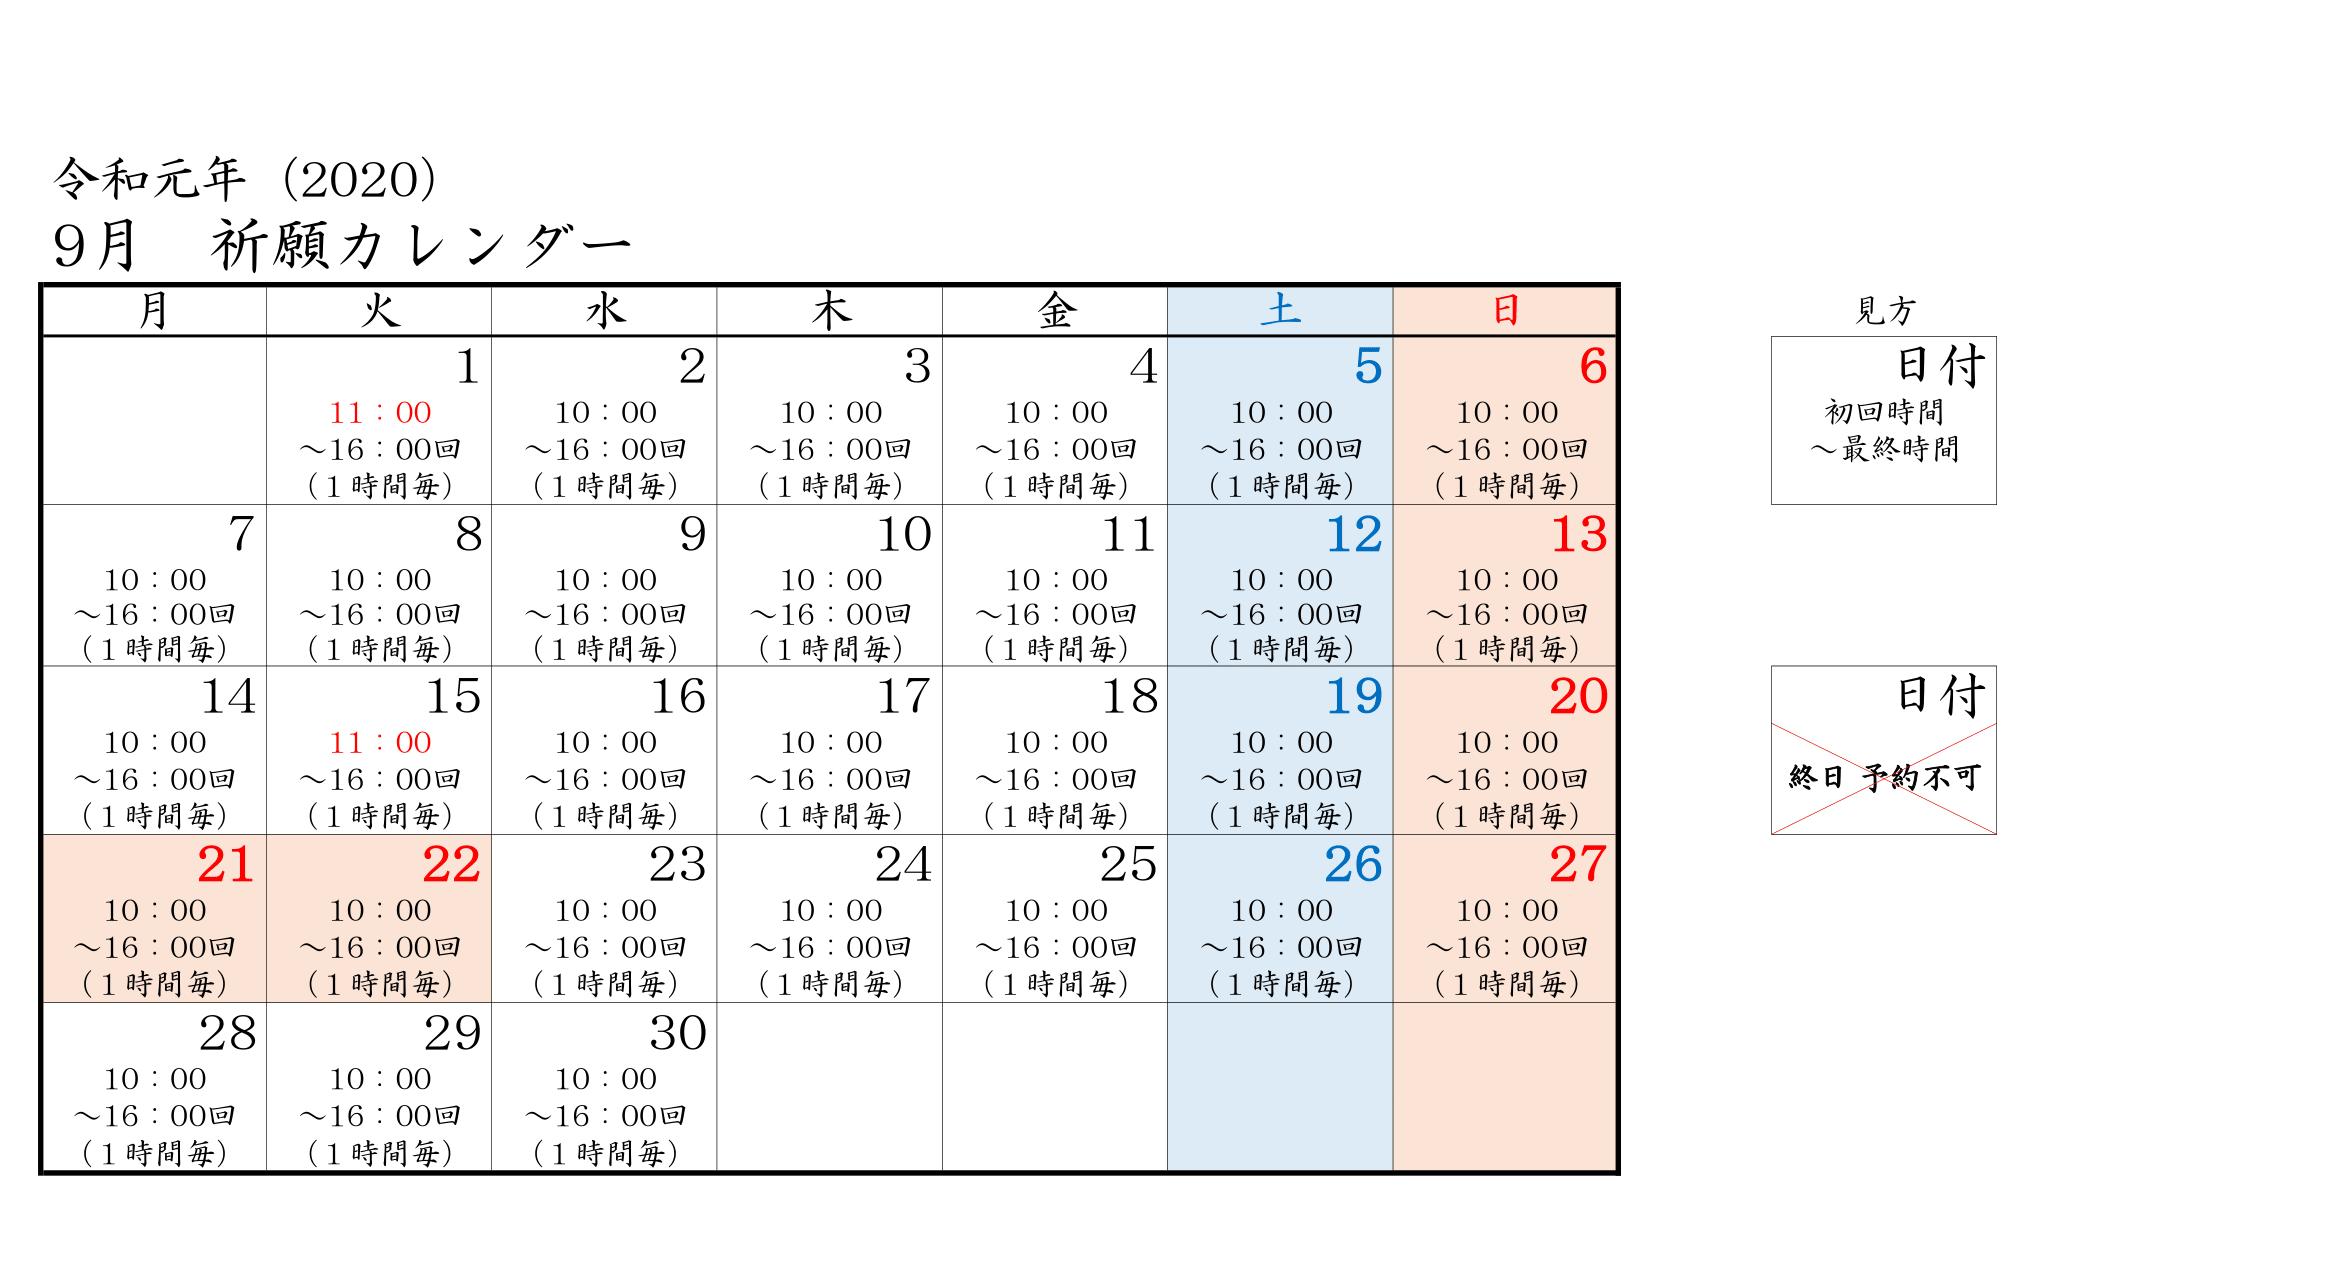 R2.09 七五三 予約カレンダー-1.png